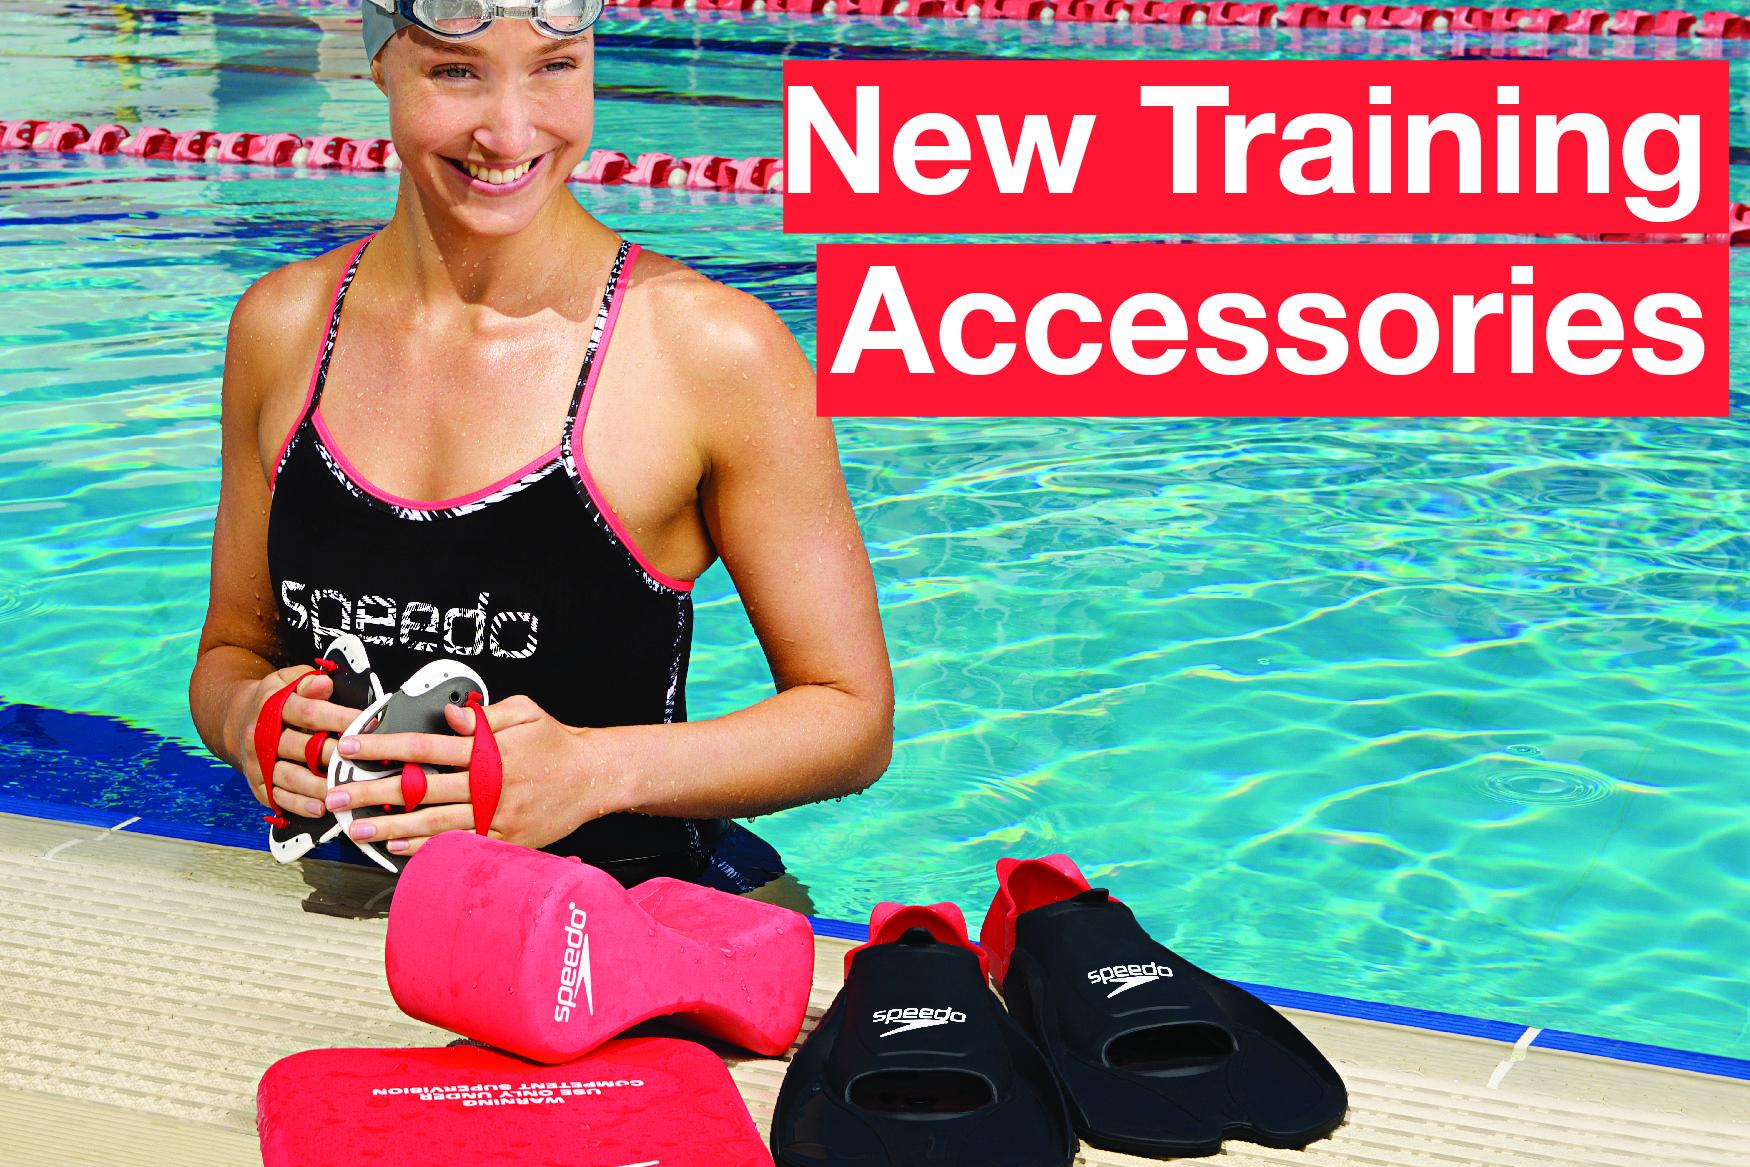 New Training Accessories